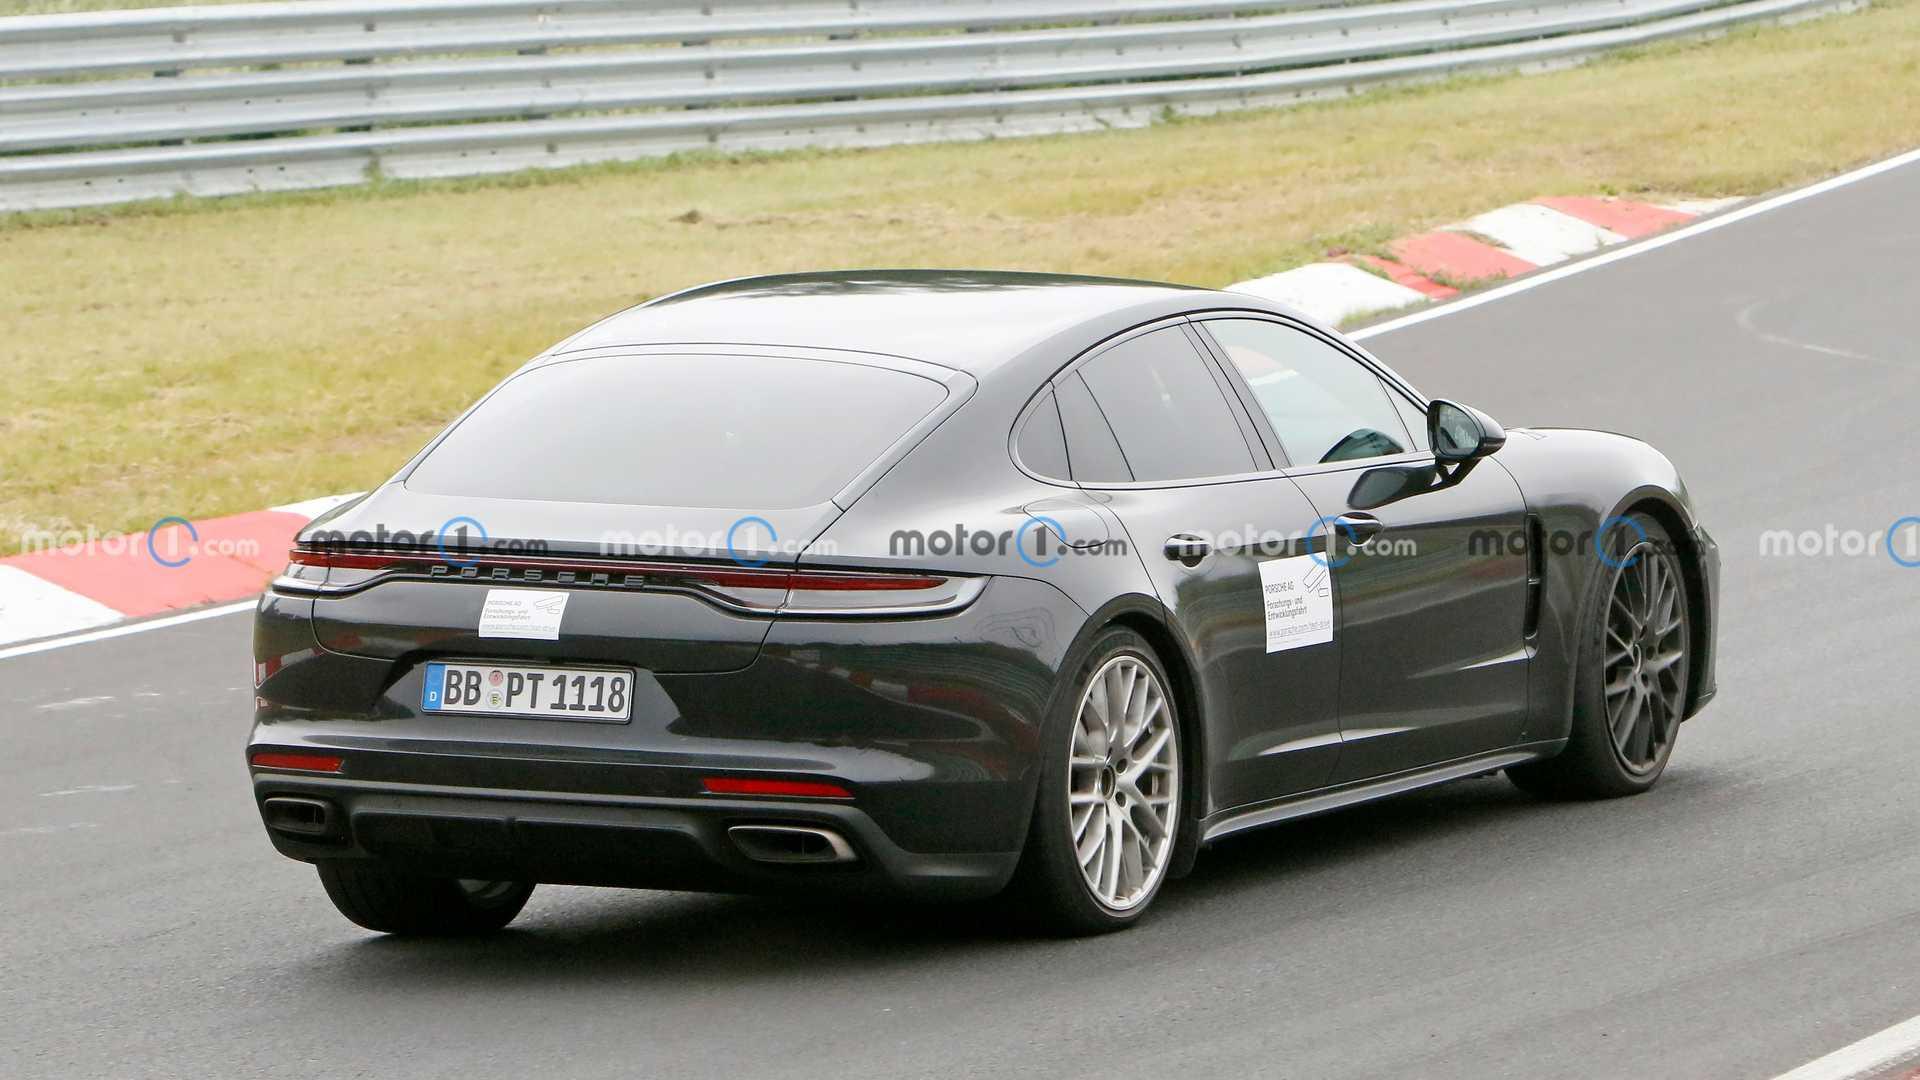 Poliftowe Porsche Panamera Turbo